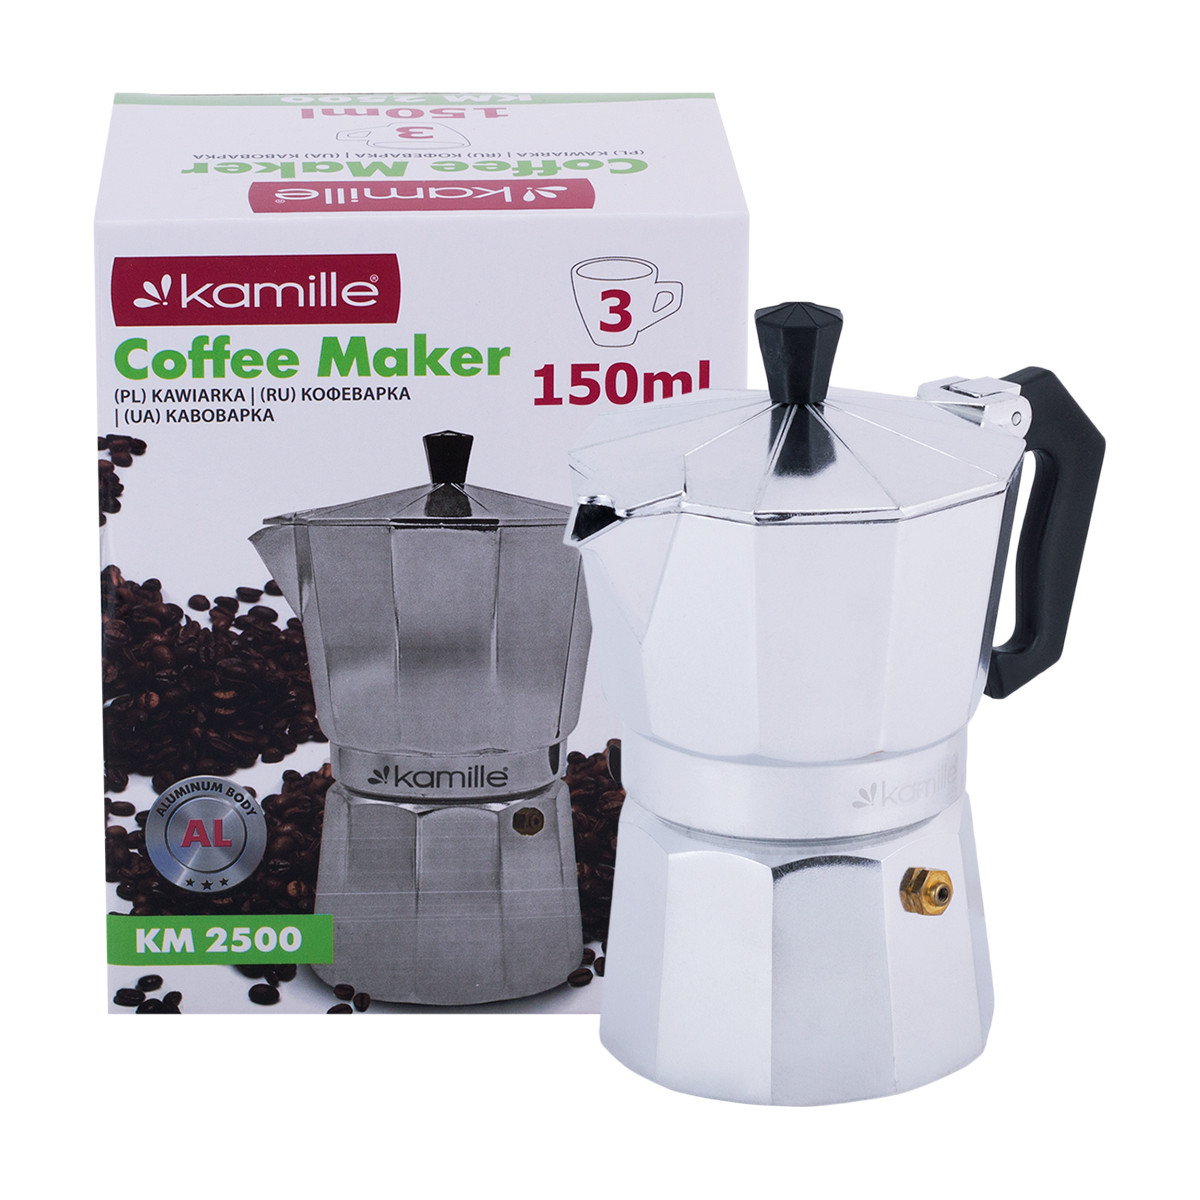 Кофеварка гейзерная Kamille 150мл из алюминия KM-2500